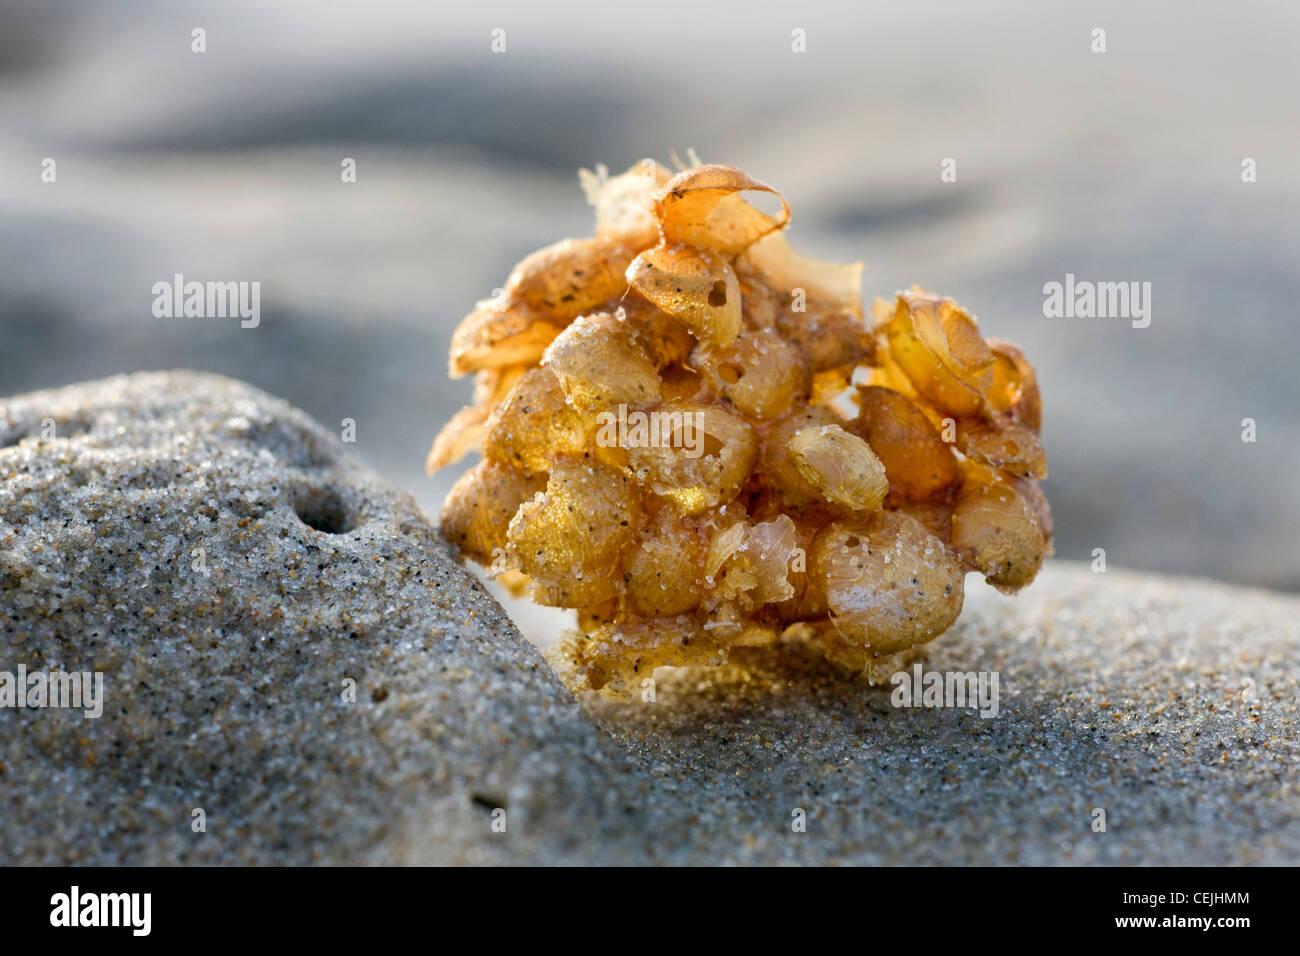 Common whelk (Buccinum undatum) egg mass / sea wash ball on beach, Belgium - Stock Image